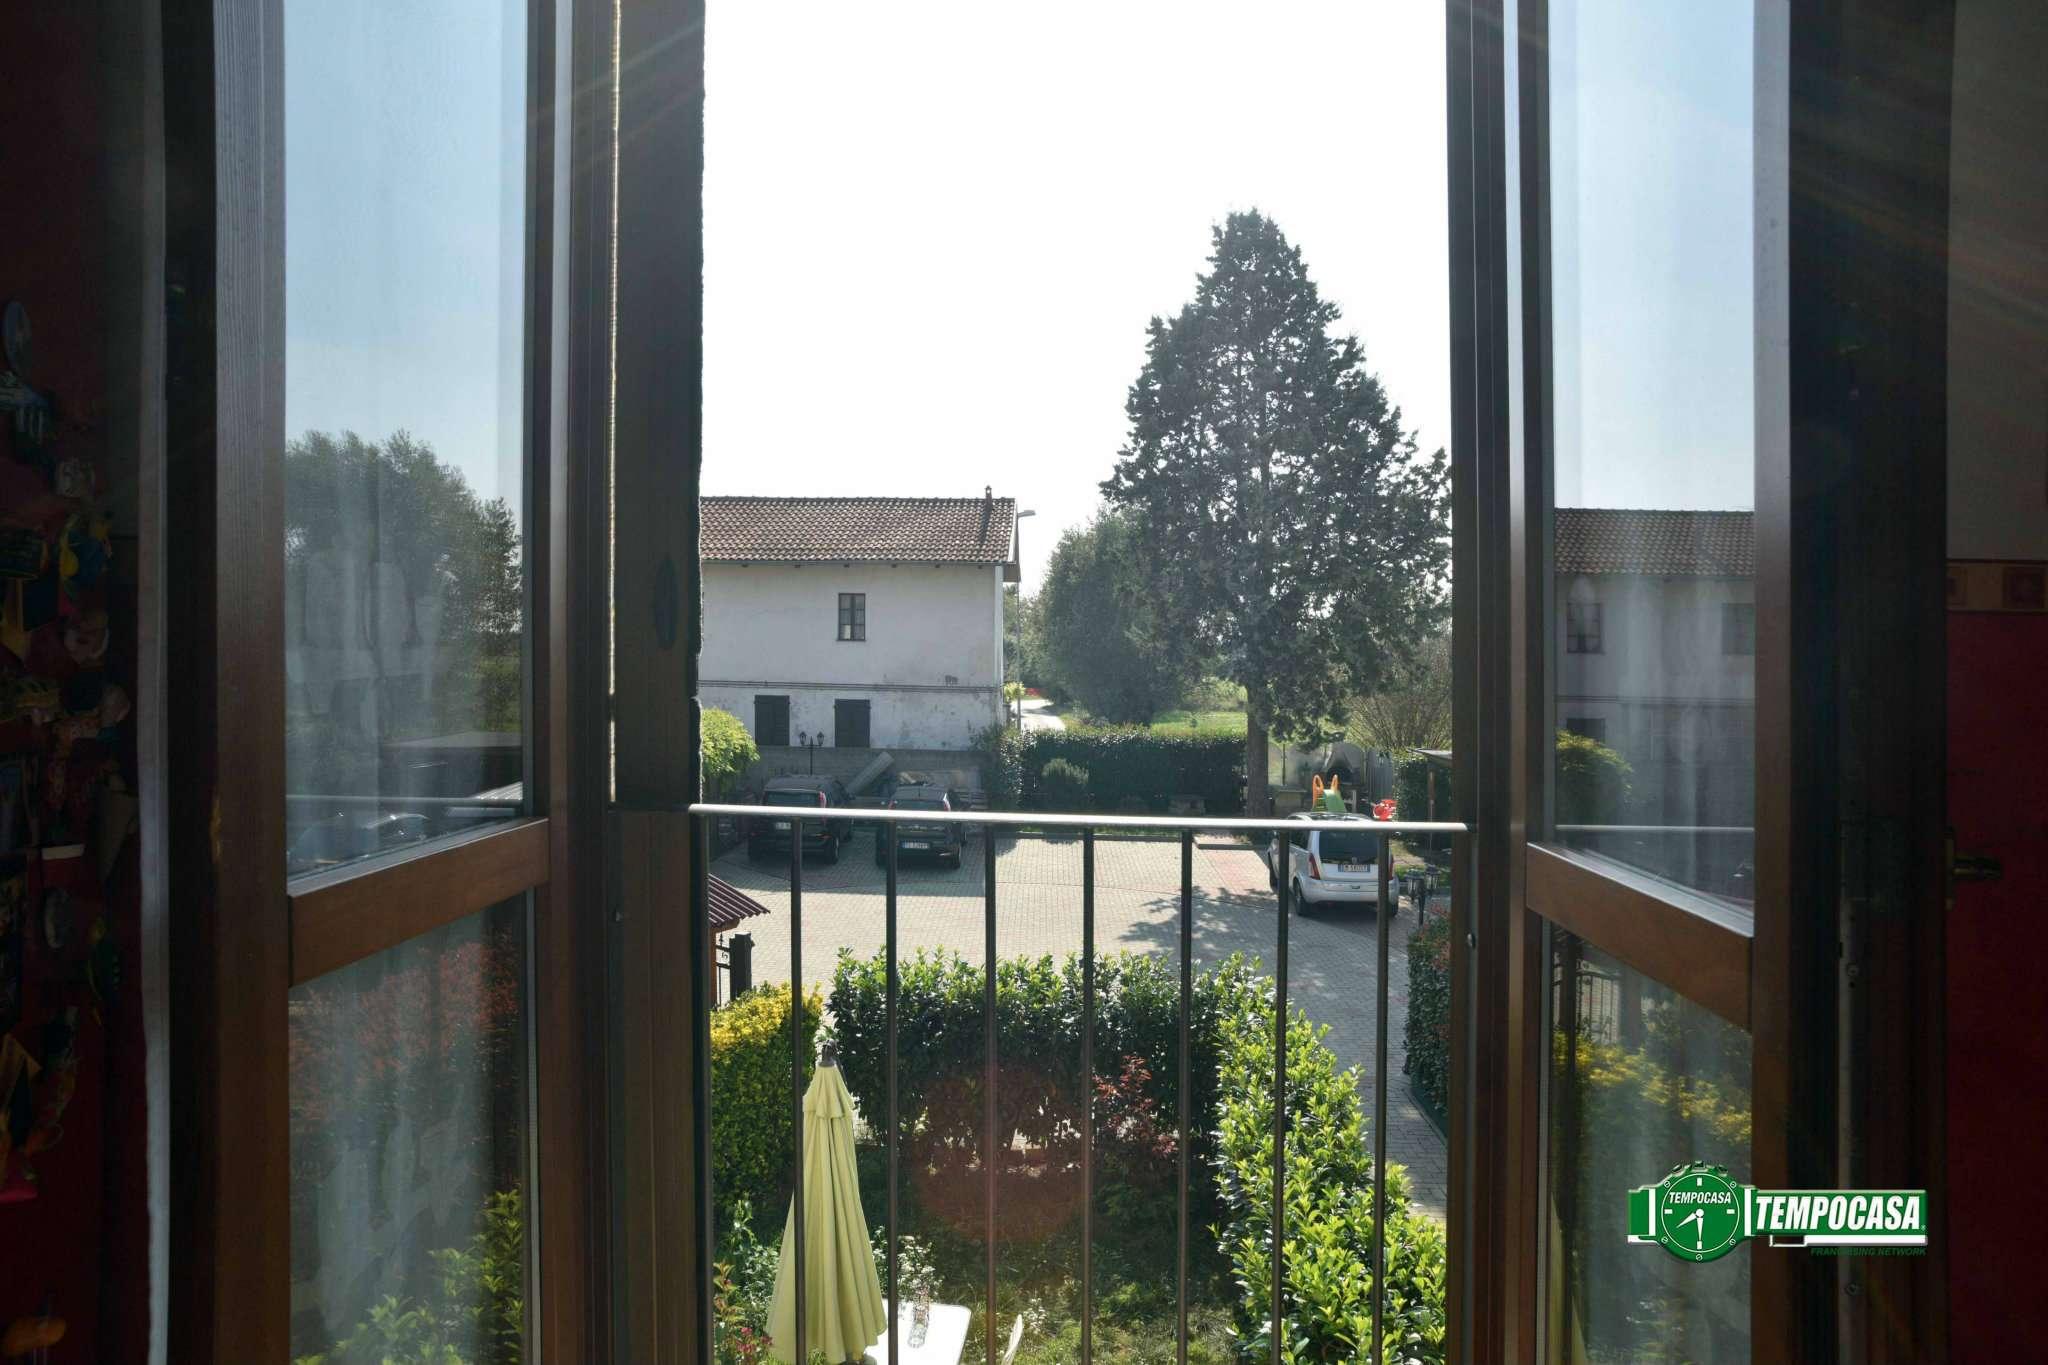 Bilocale Settimo Torinese Via Fornaci 9